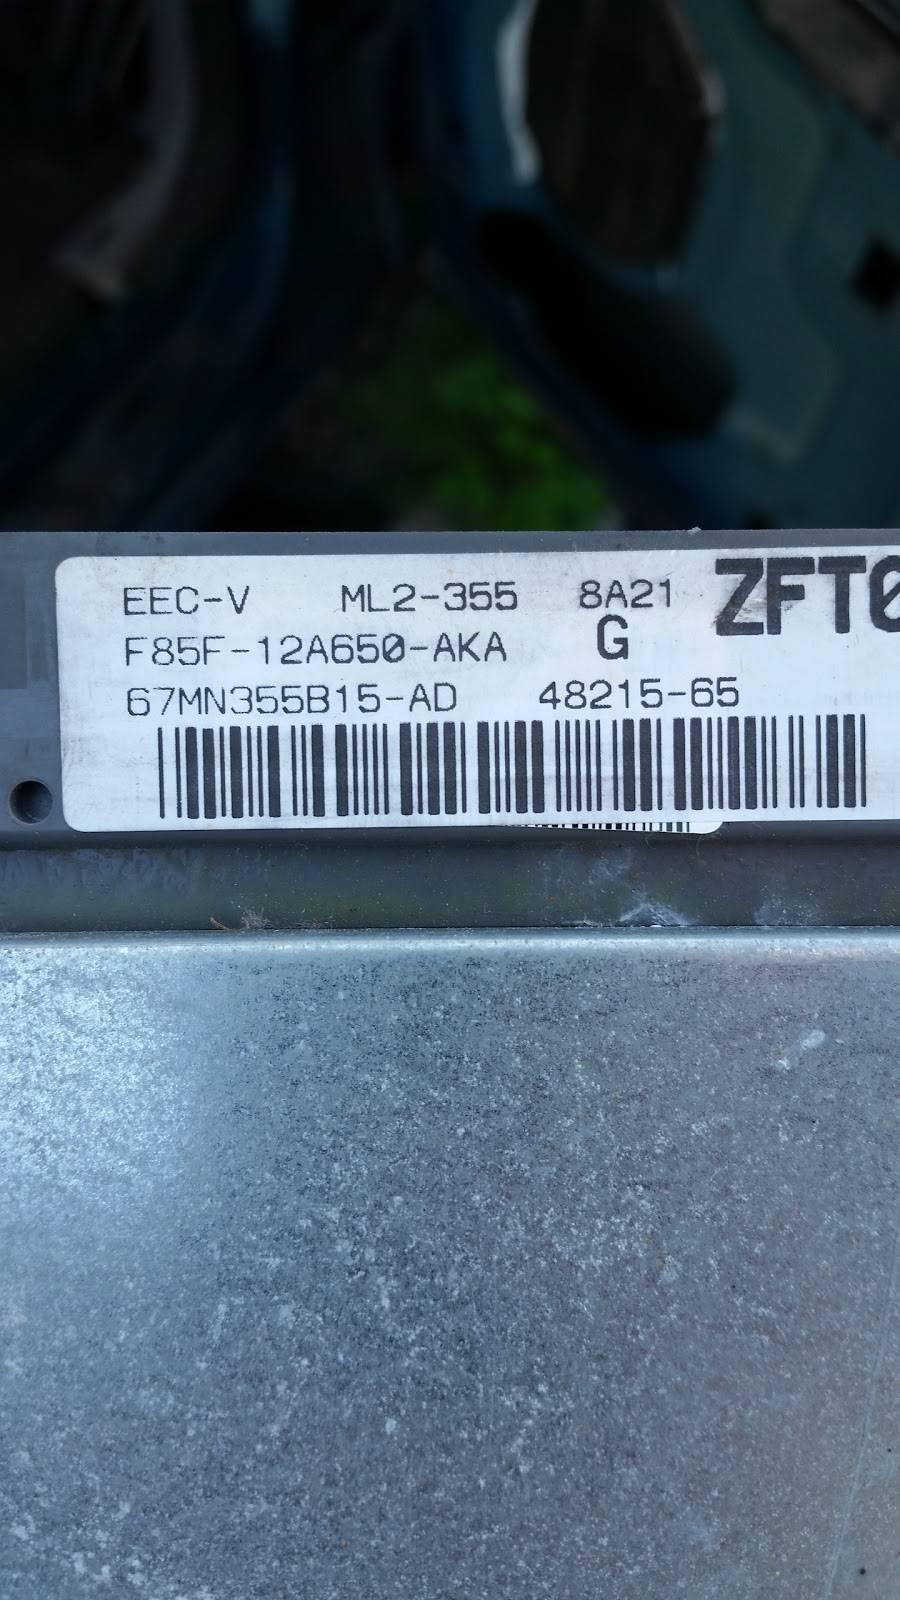 Dismantlers 2000 - car repair    Photo 4 of 5   Address: 6014, 5700 Elliott Reeder Rd, Fort Worth, TX 76117, USA   Phone: (817) 834-0711